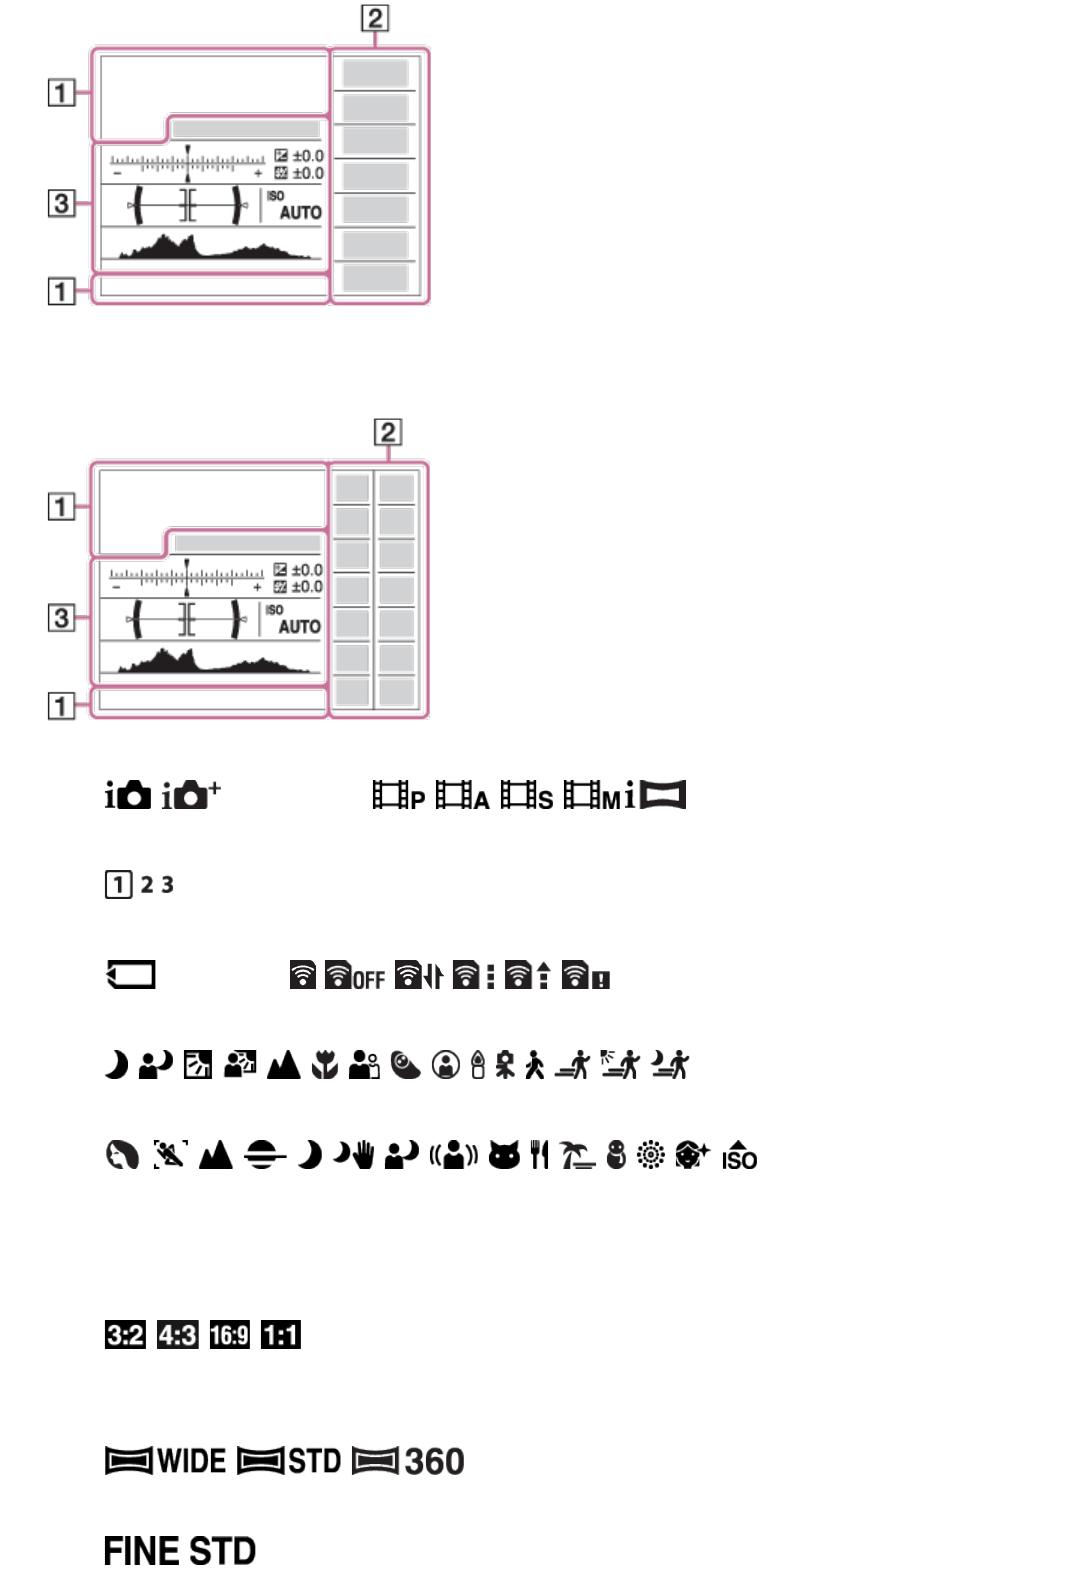 Sony DSC HX80 User Manual Help Guide (Printable PDF